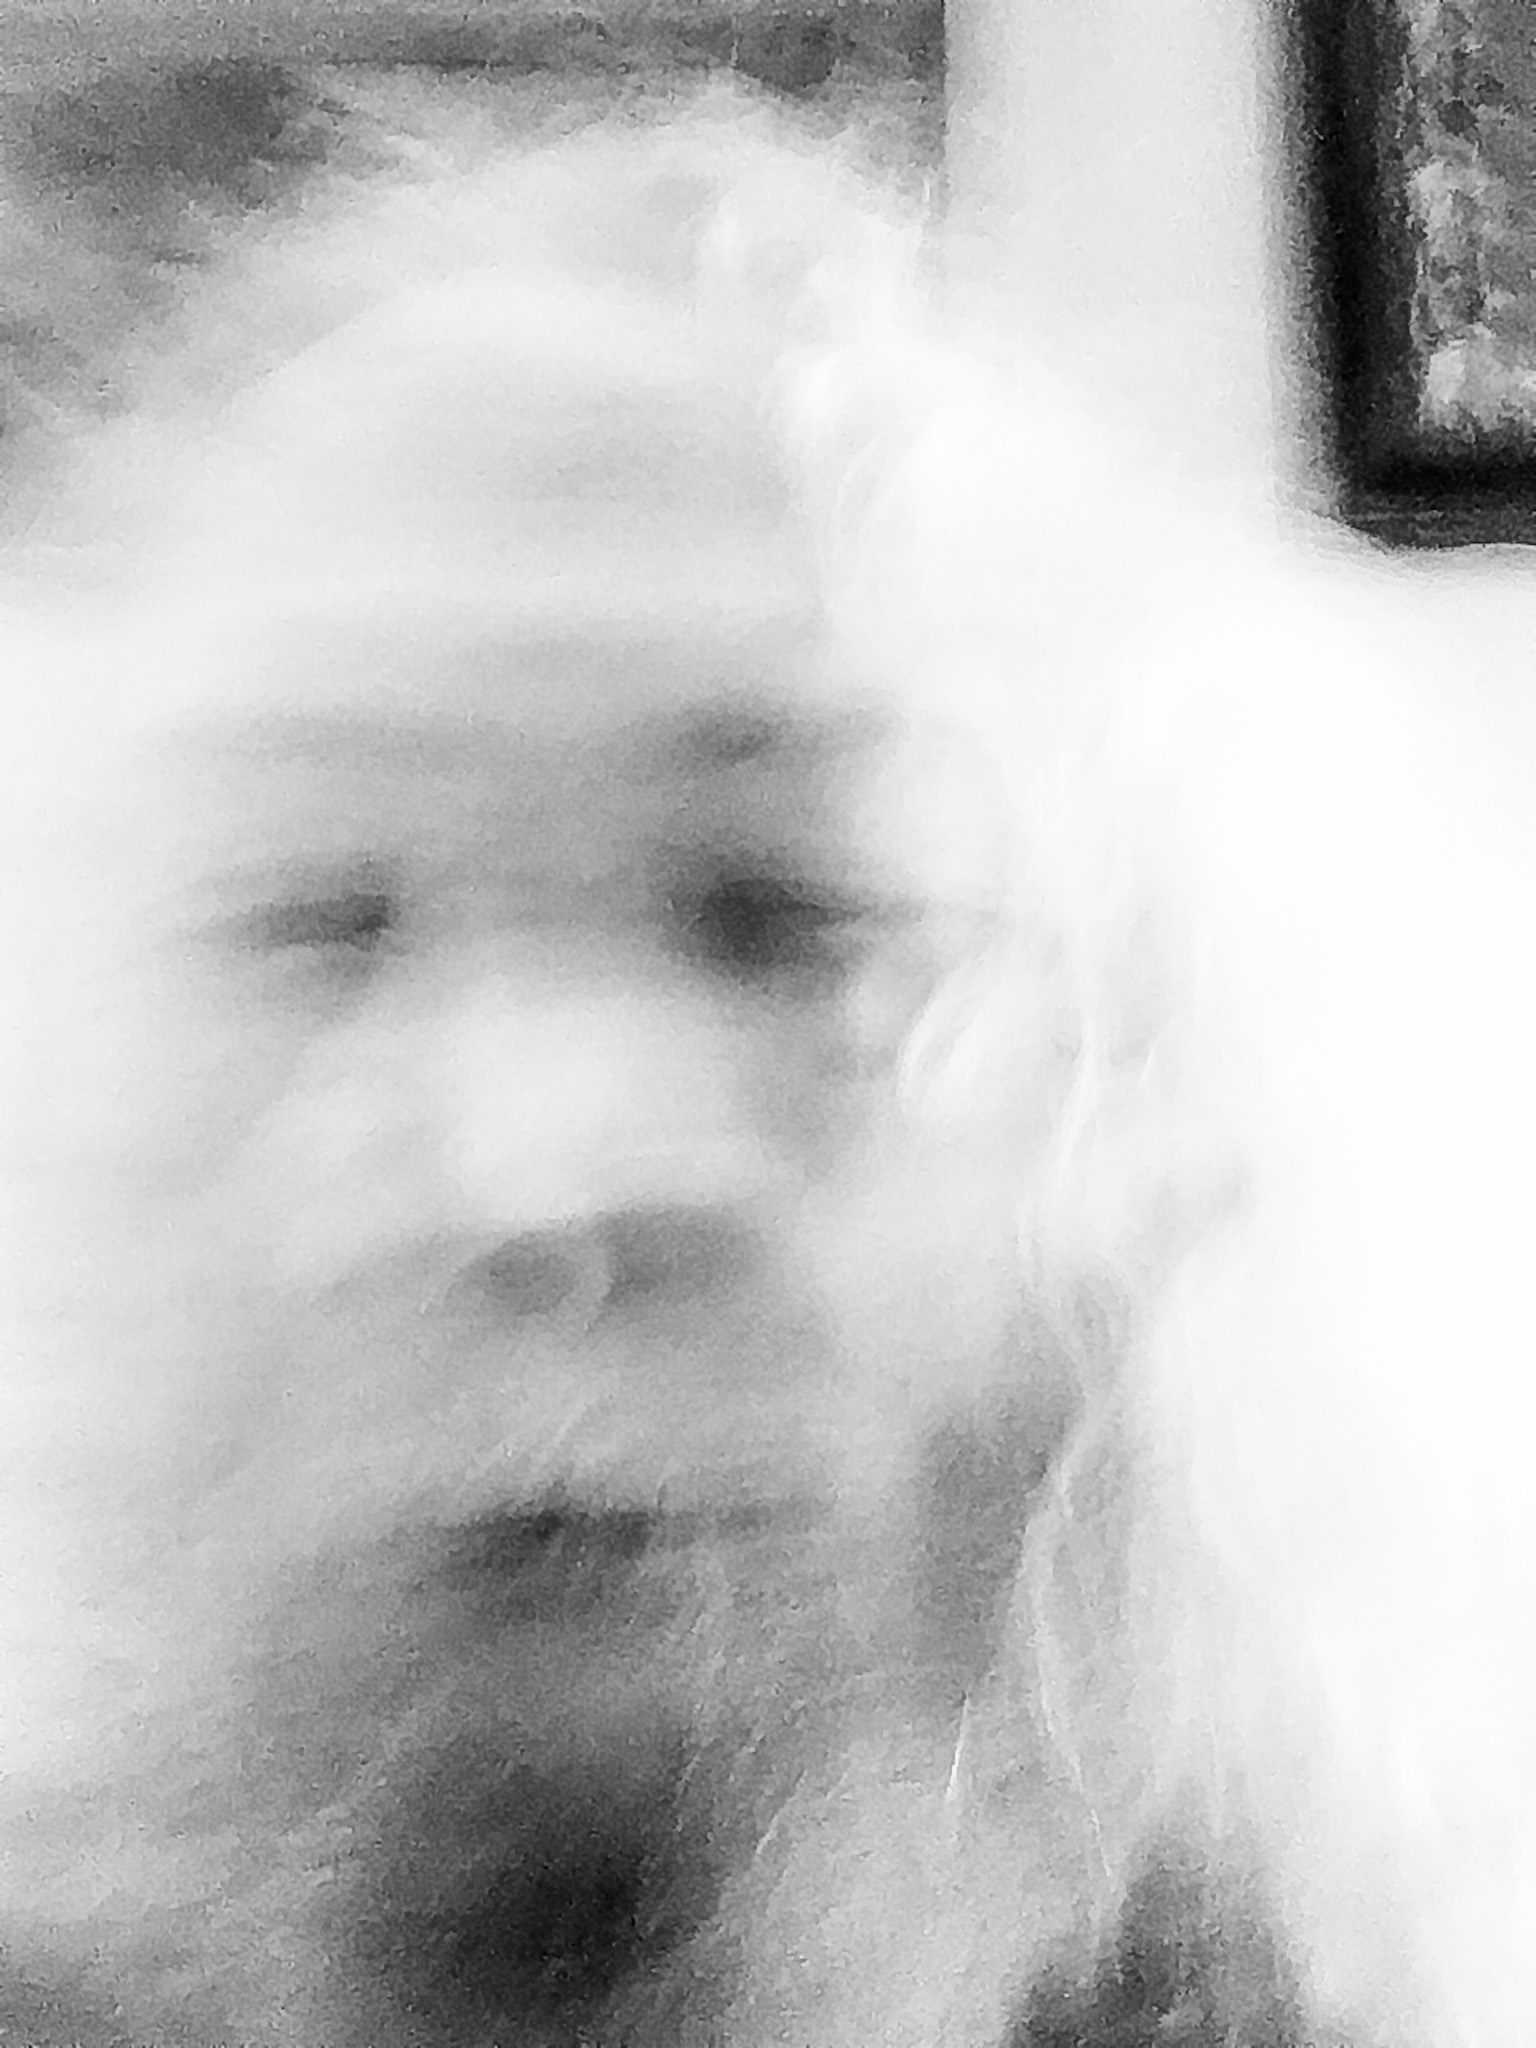 Selfless Portrait ghost market - divinewind | ello